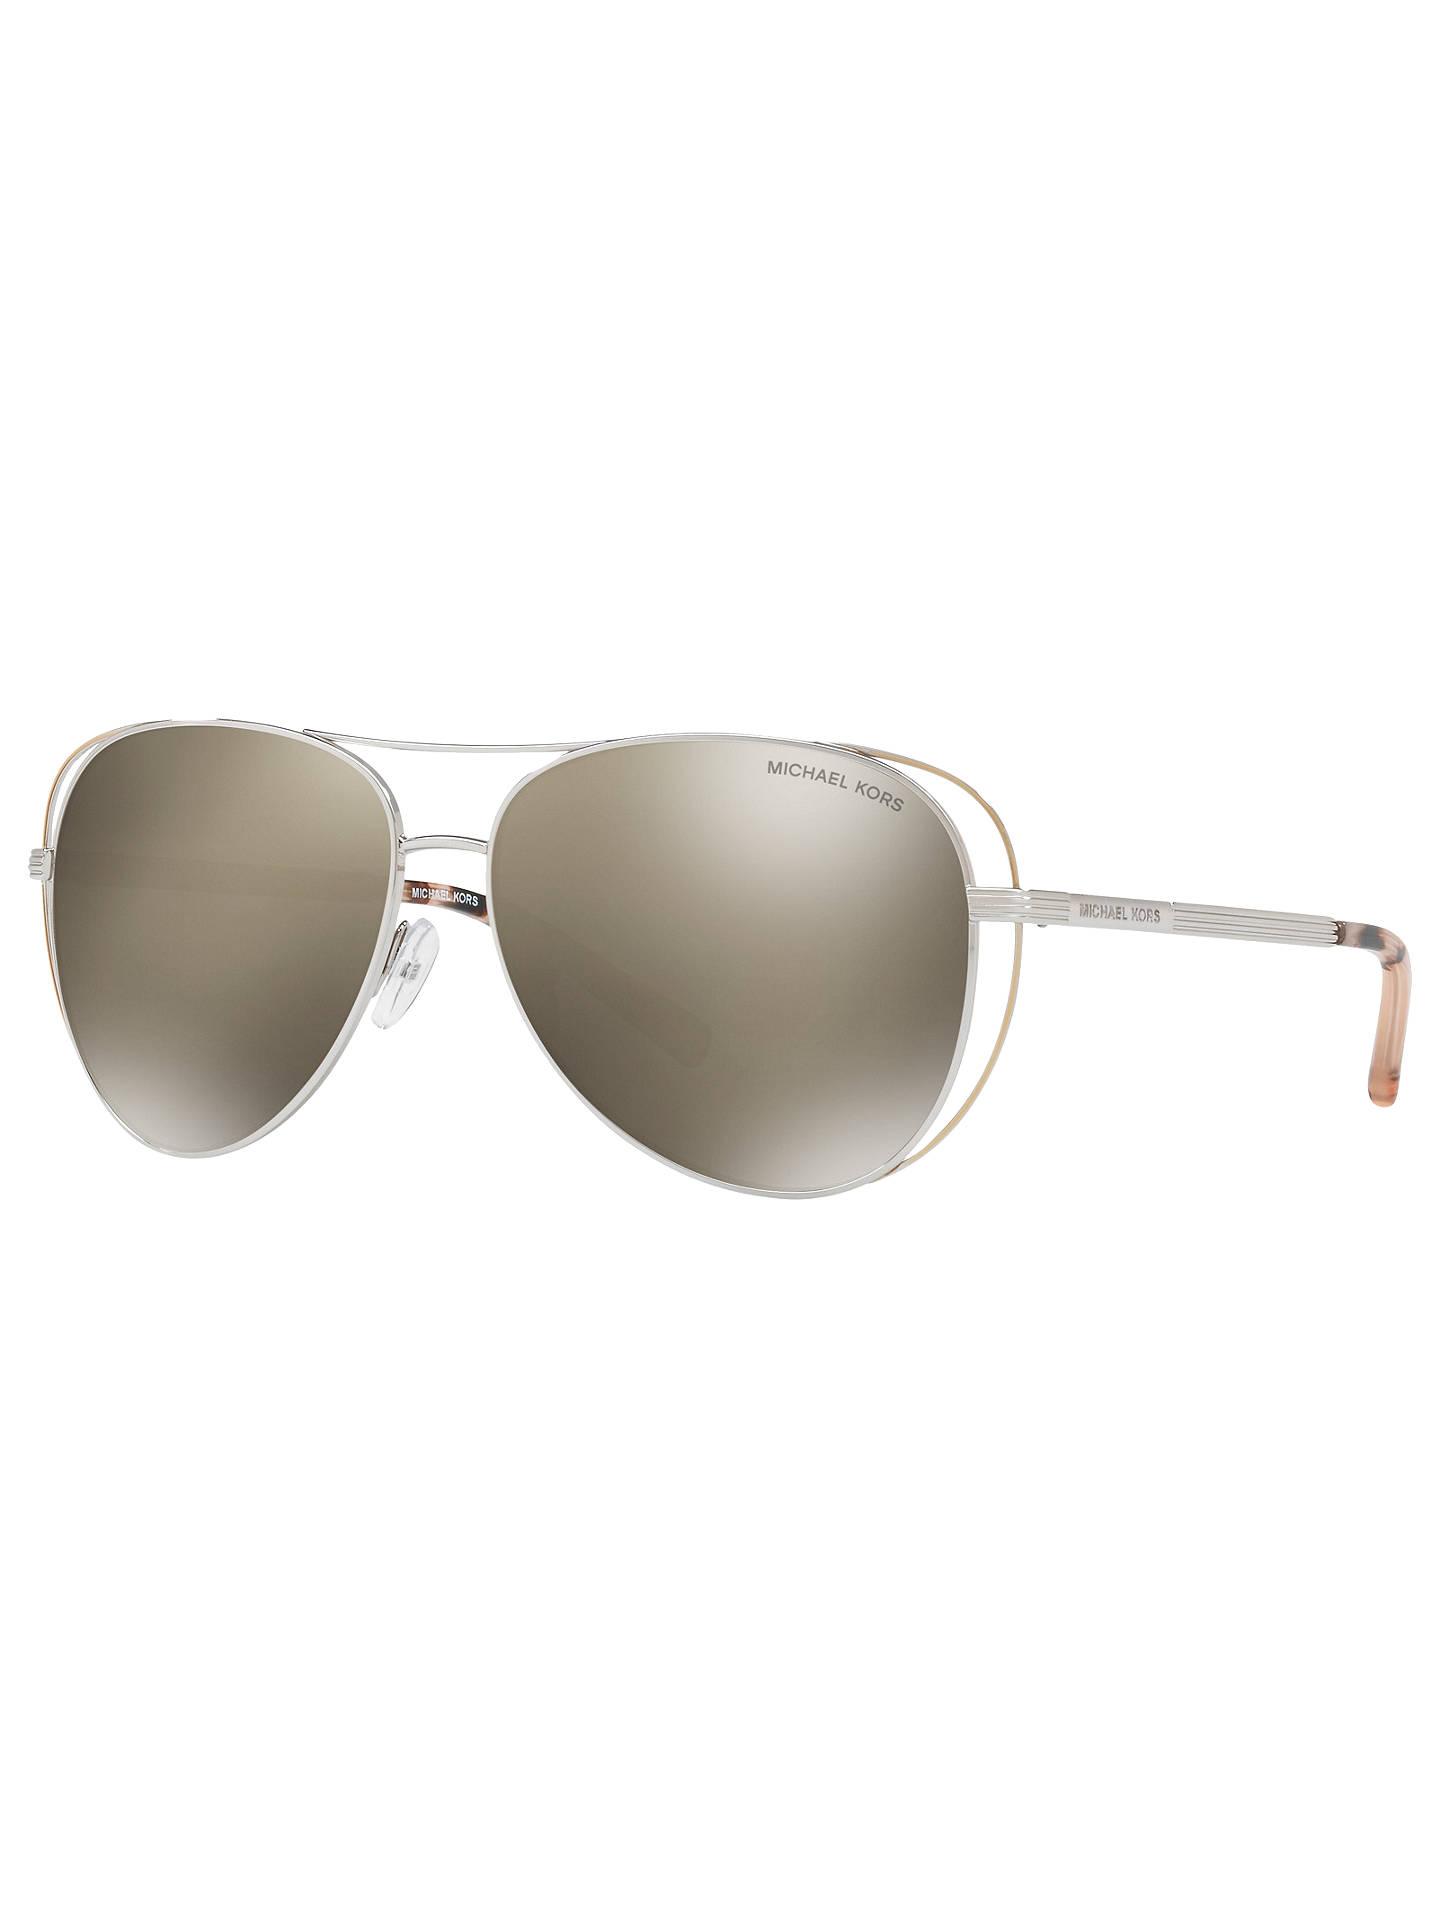 33c531911eaa Michael Kors MK1024 Lai Aviator Sunglasses at John Lewis   Partners